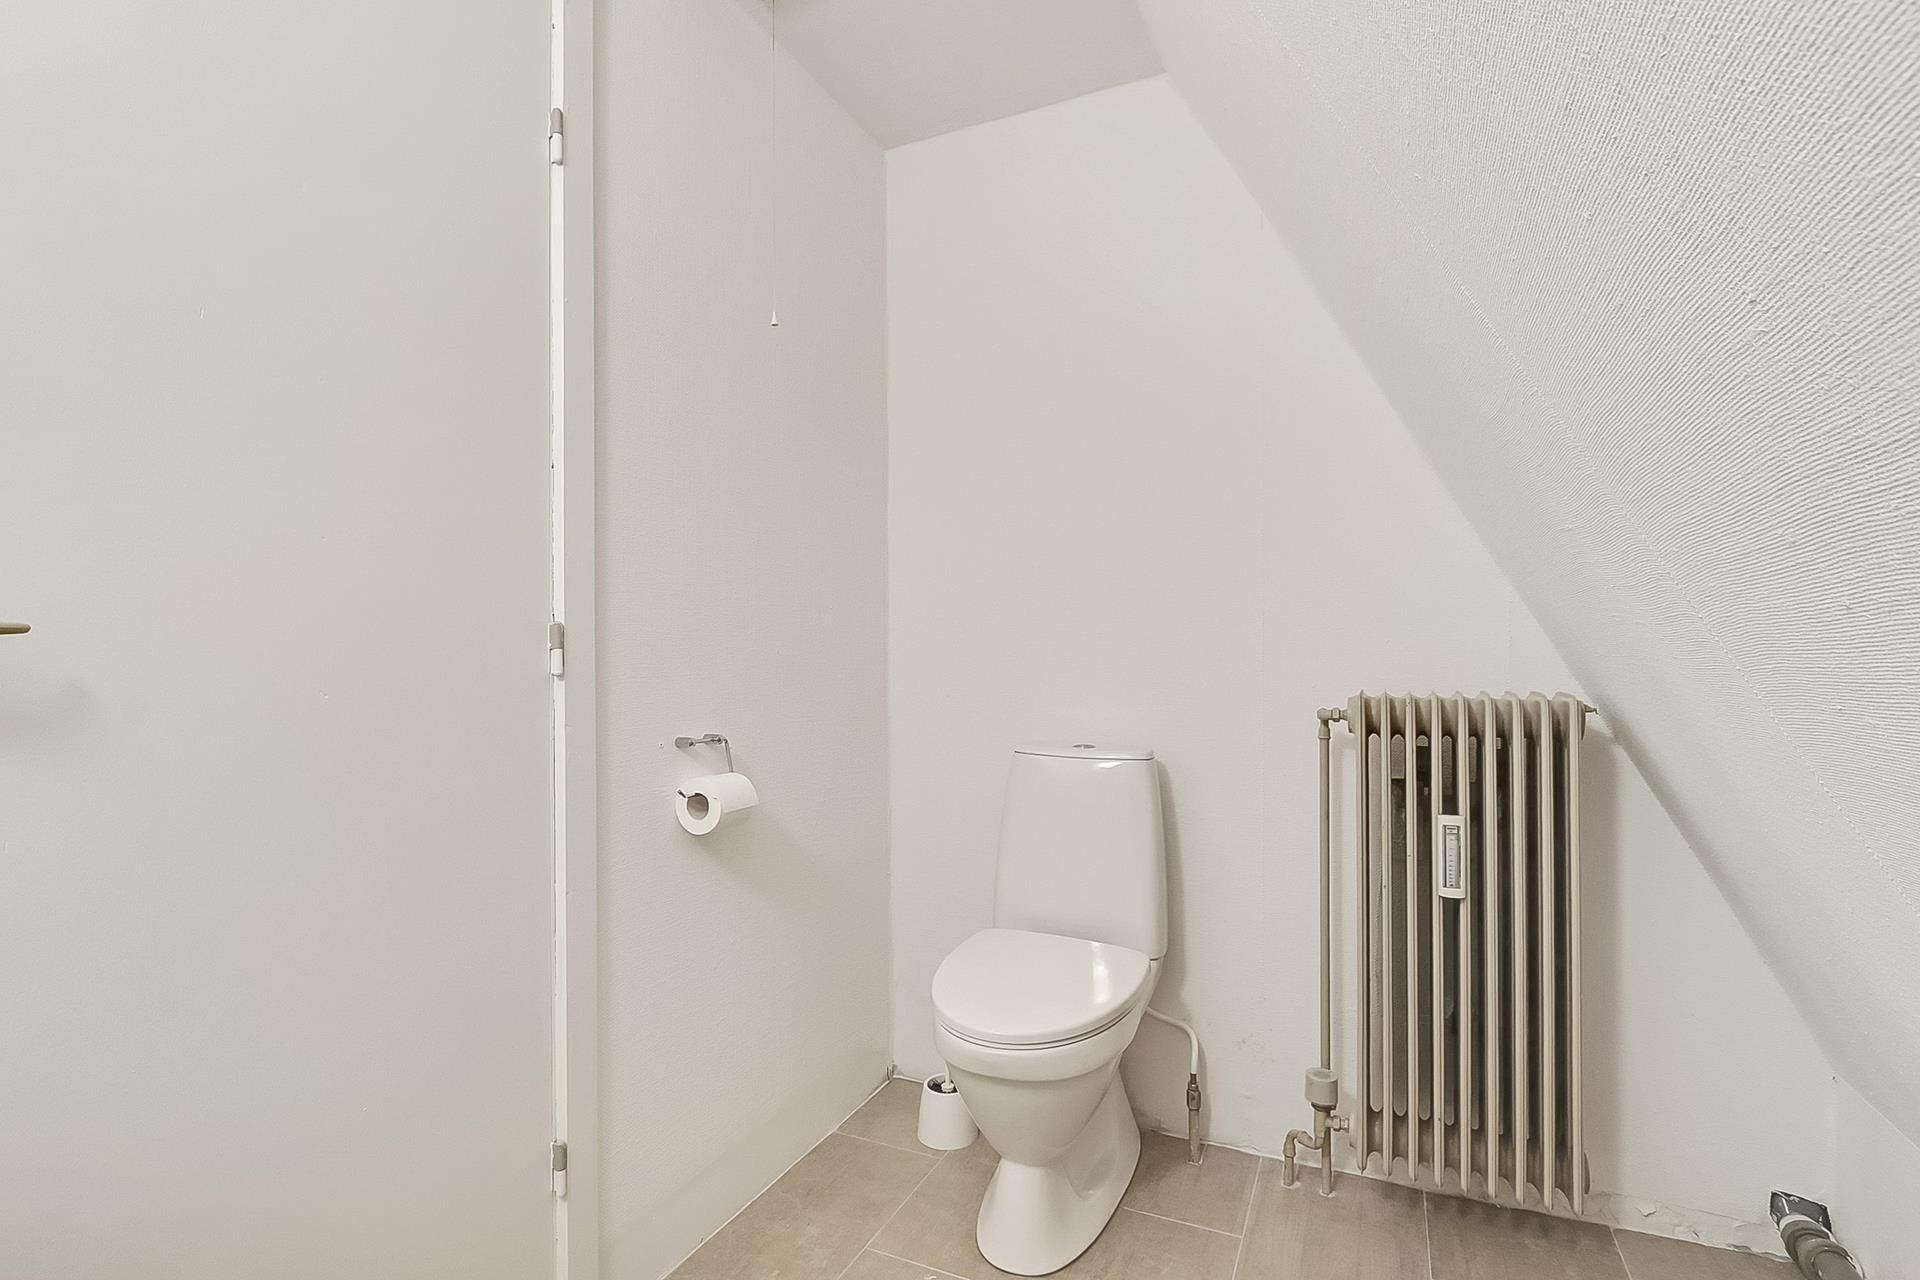 Bolig/erhverv på Østergade i Faaborg - Toilet